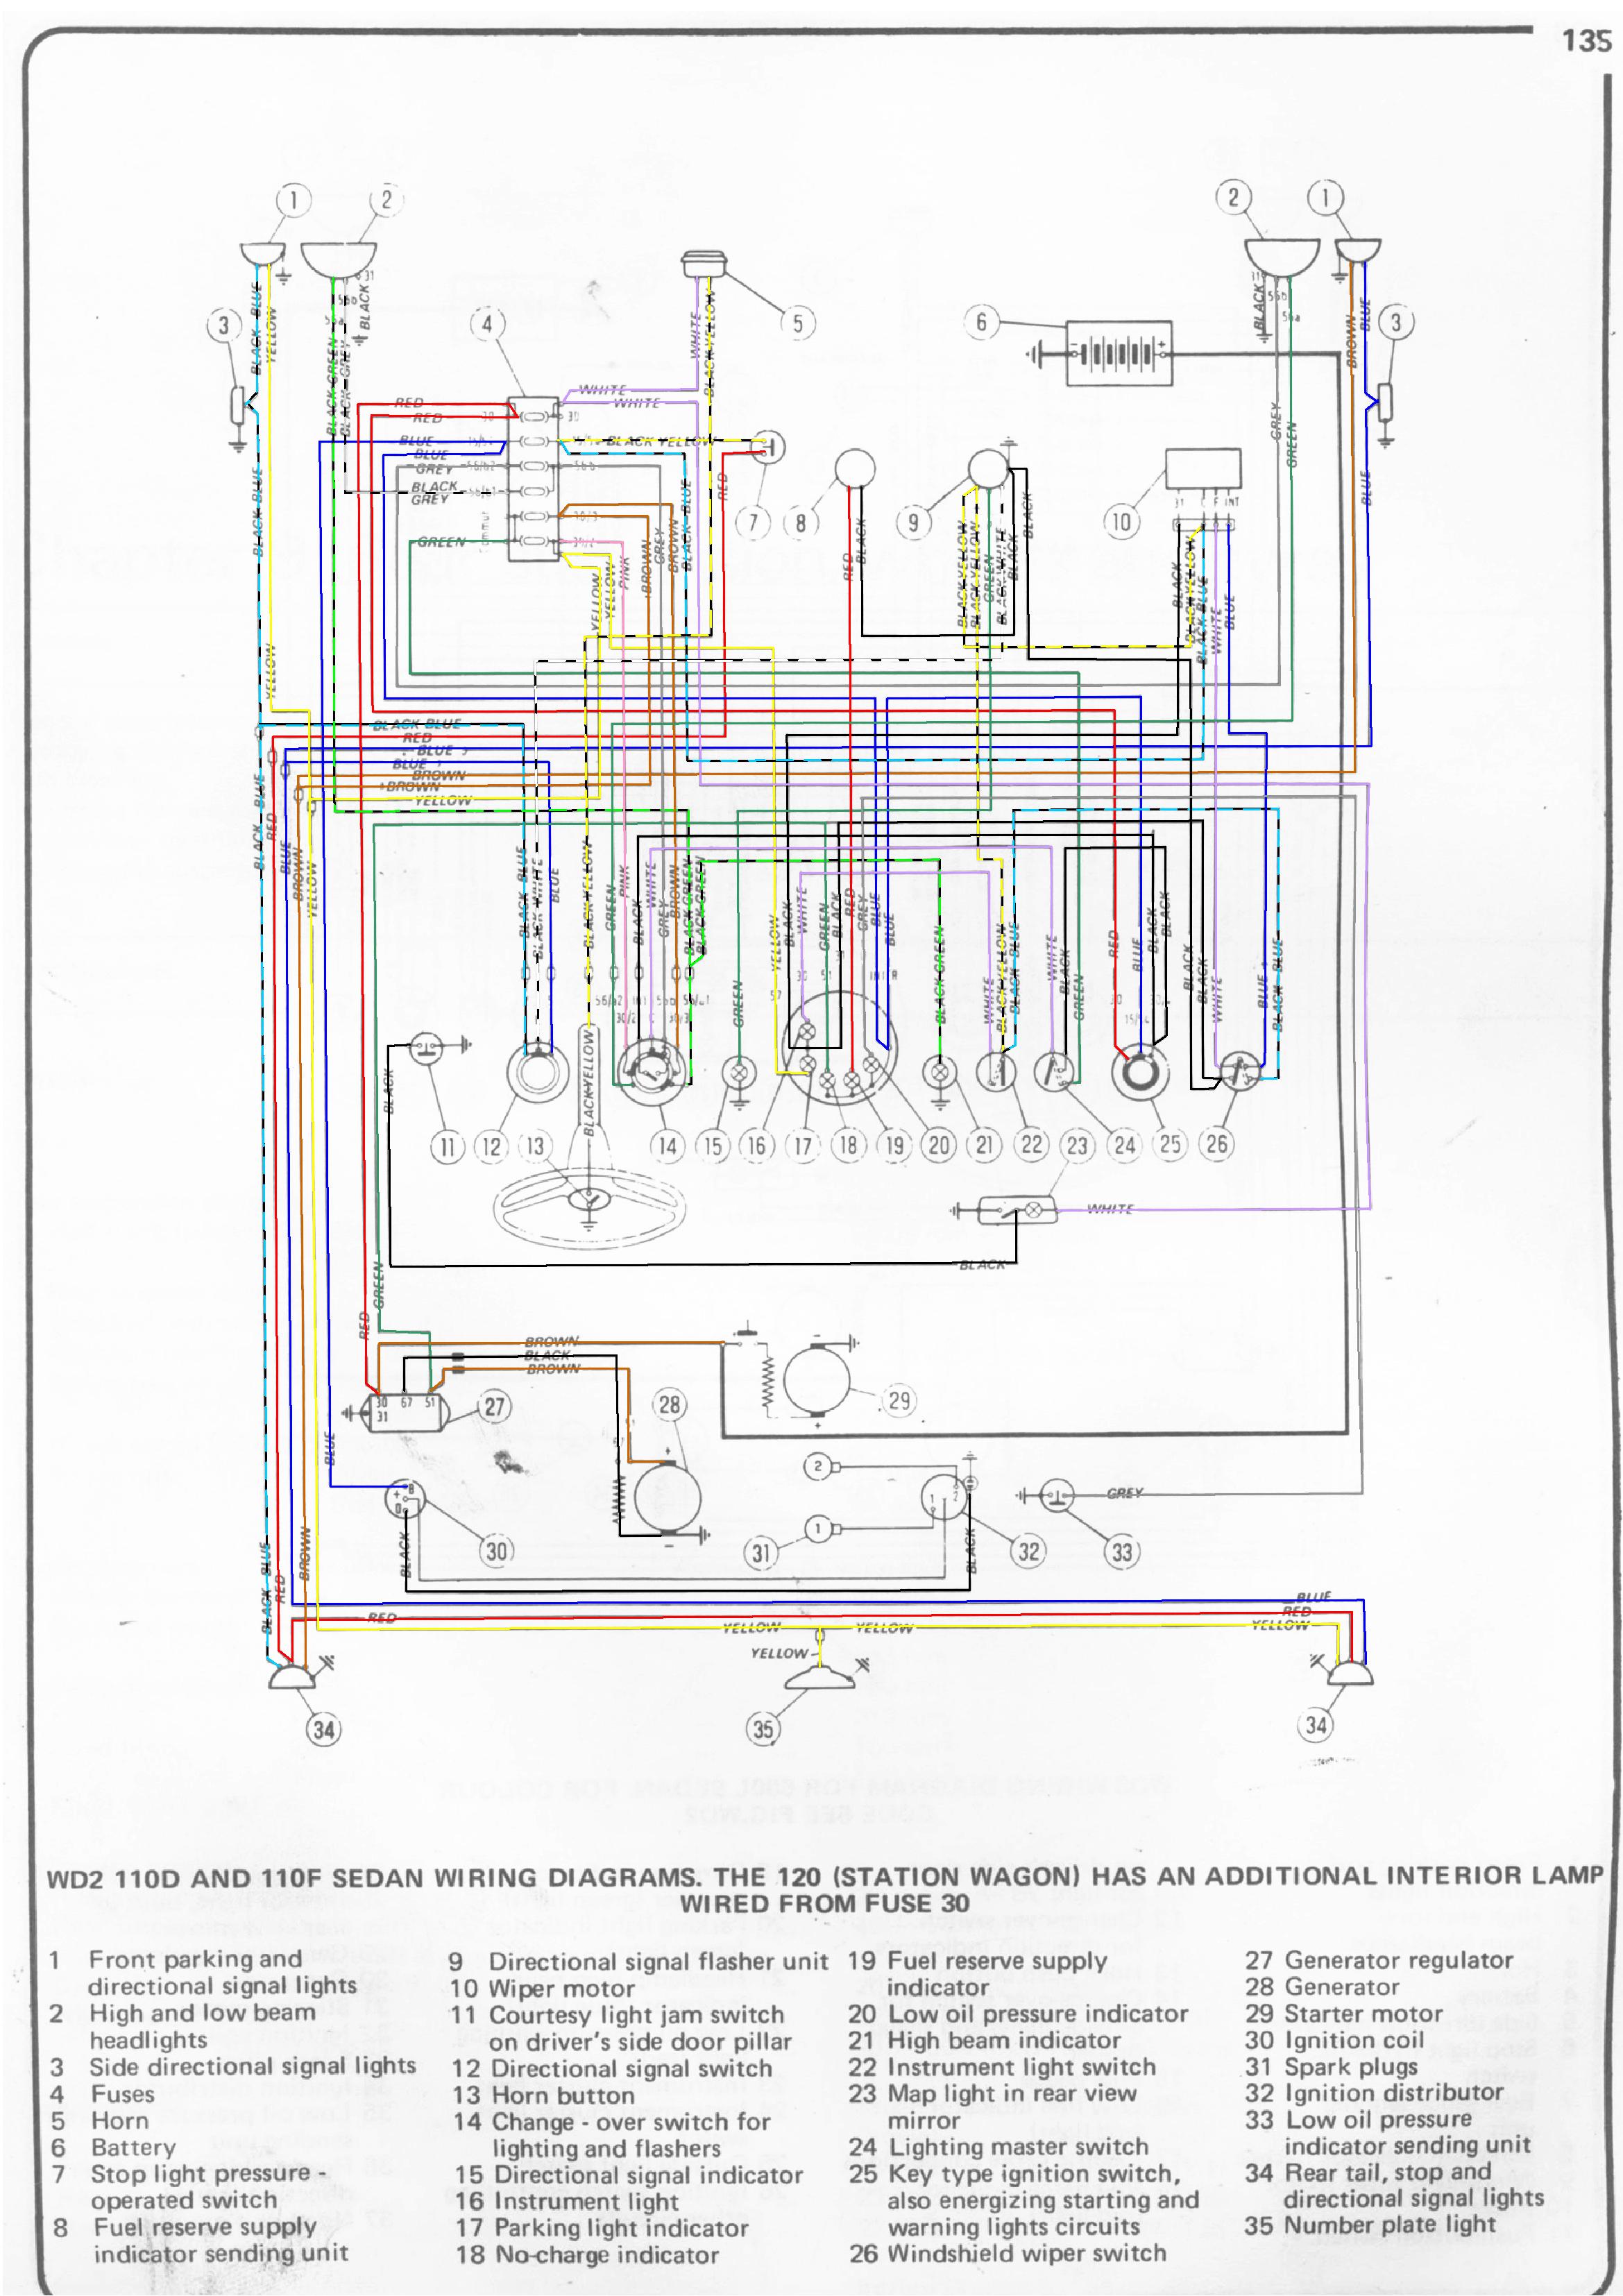 medium resolution of fiat wiring diagrams wiring diagram third level rh 10 14 jacobwinterstein com mitsubishi starion wiring diagram